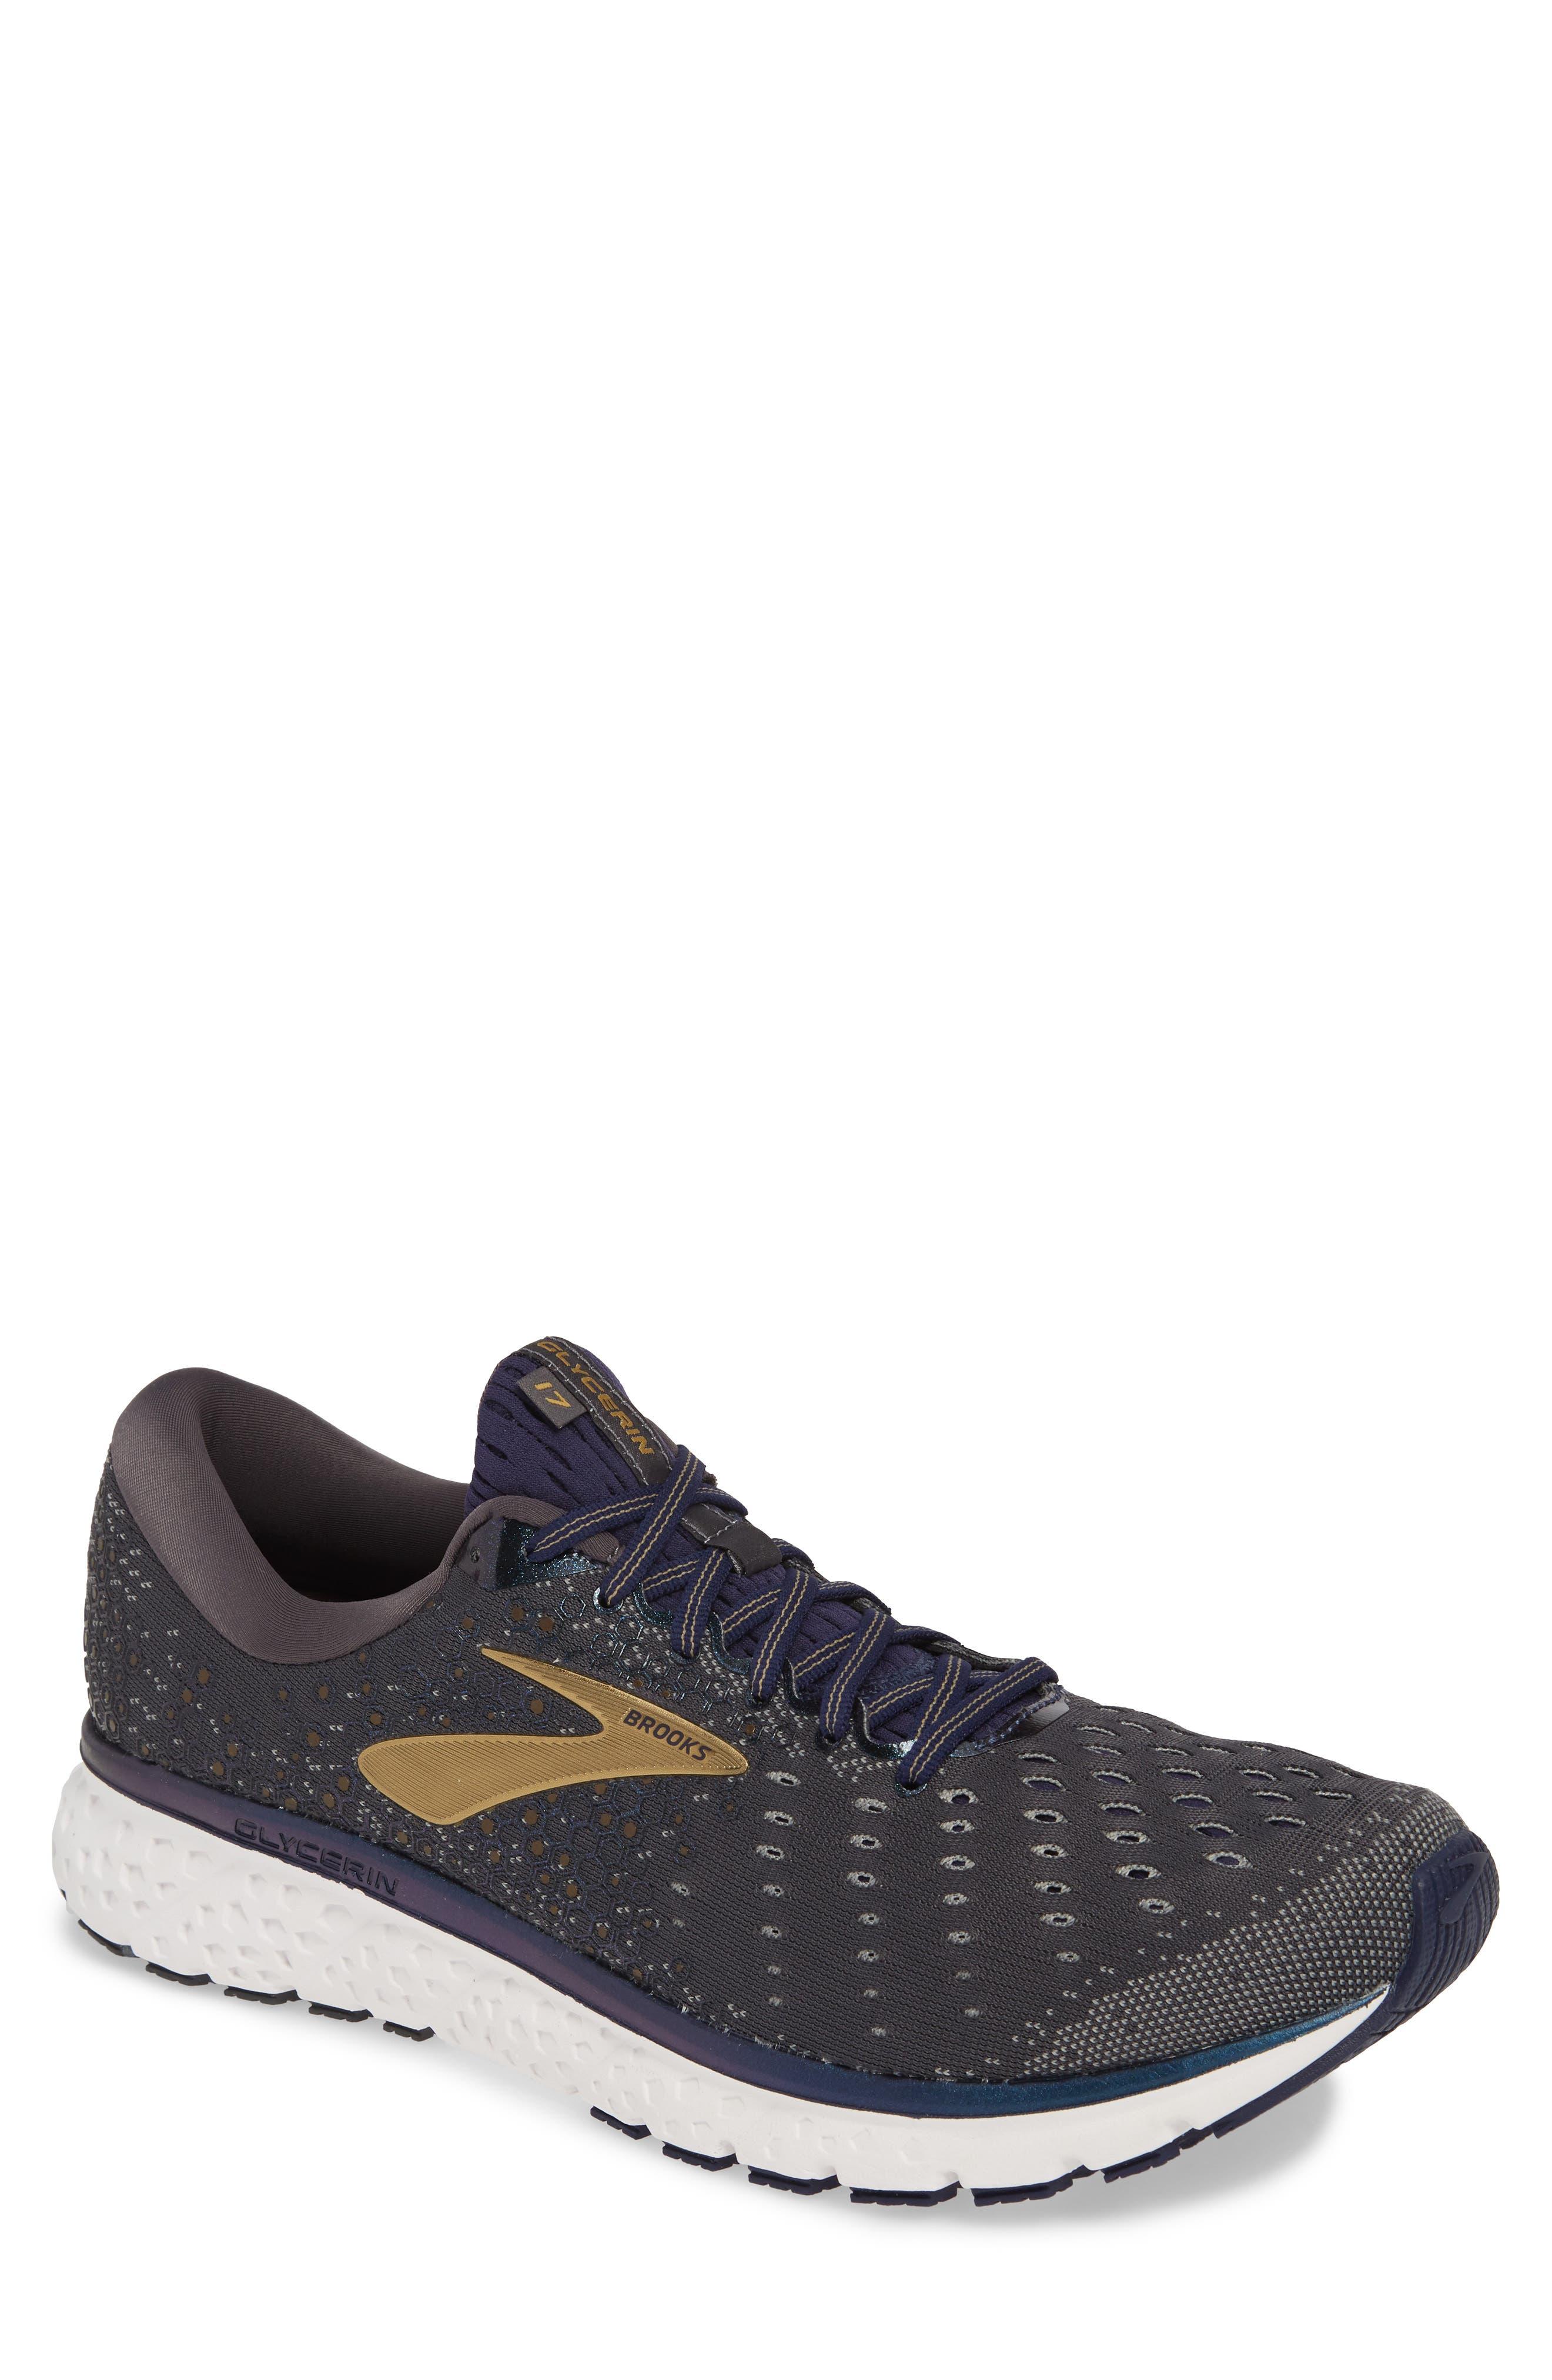 Brooks Glycerin 17 Running Shoe, Grey